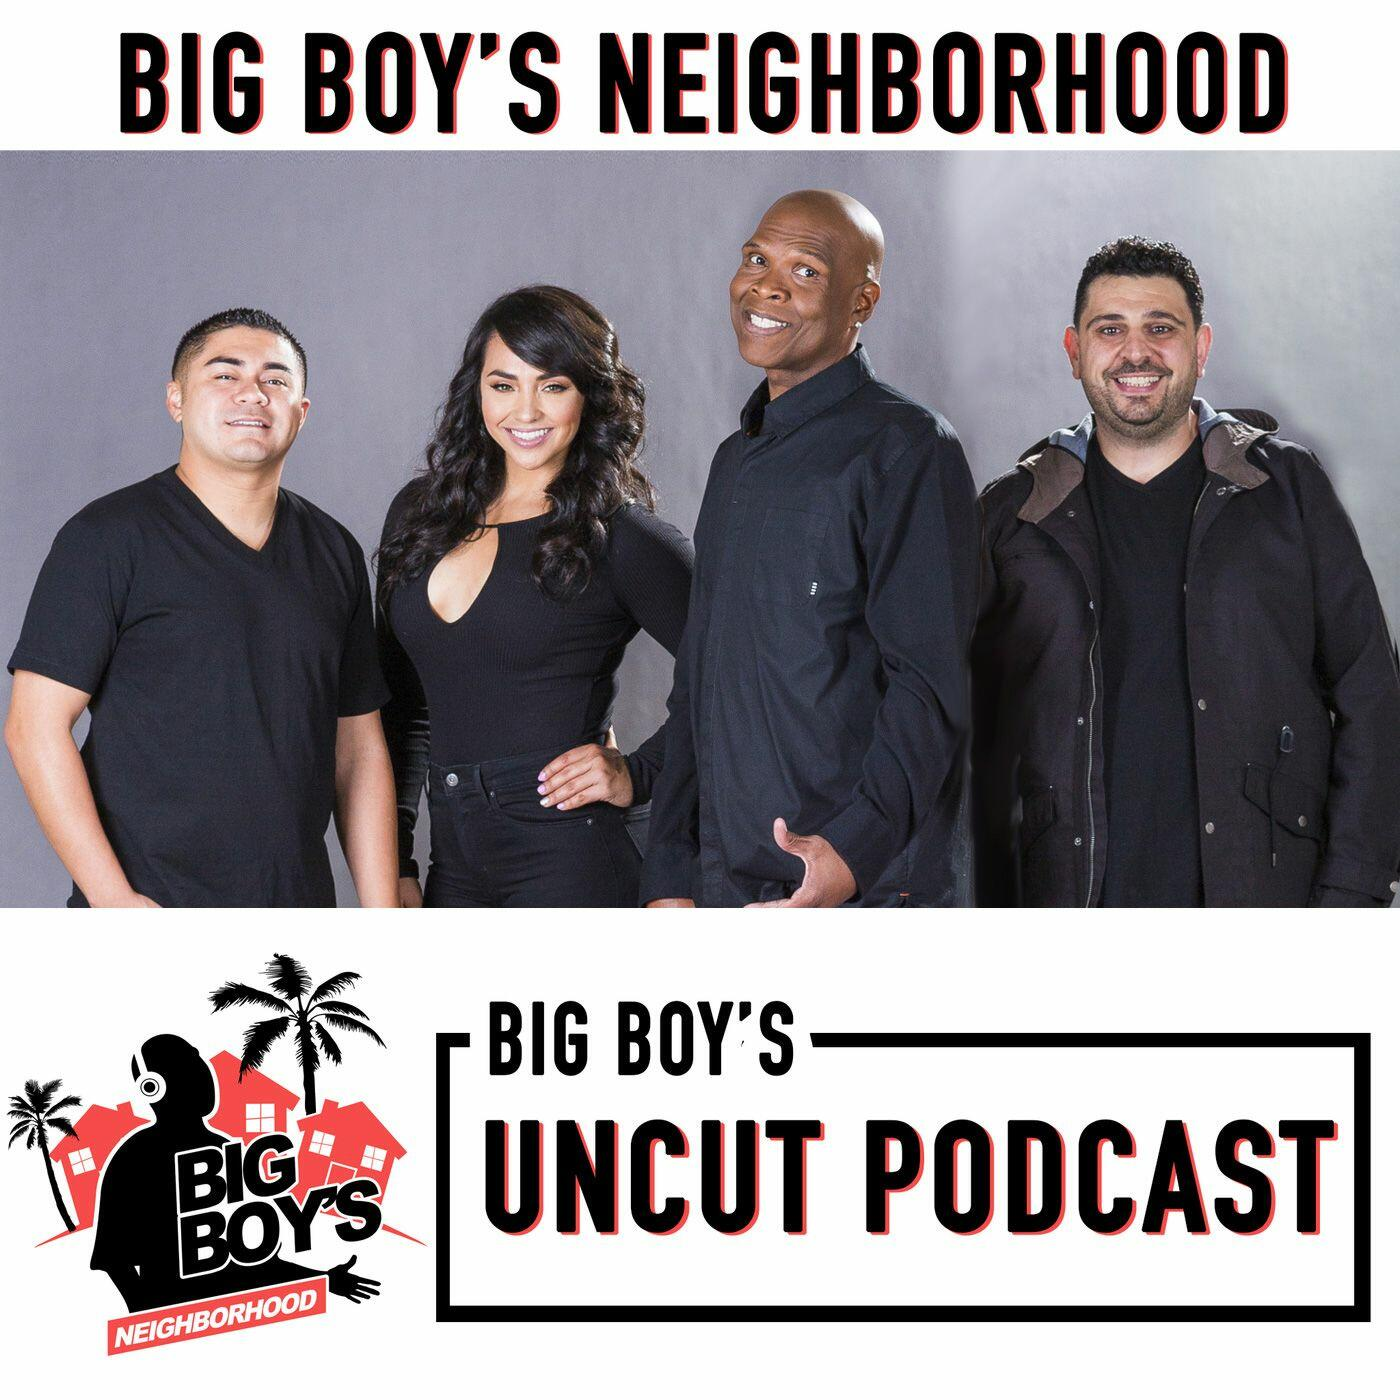 Listen Free To Big Boy Uncut On Iheartradio Podcasts Iheartradio